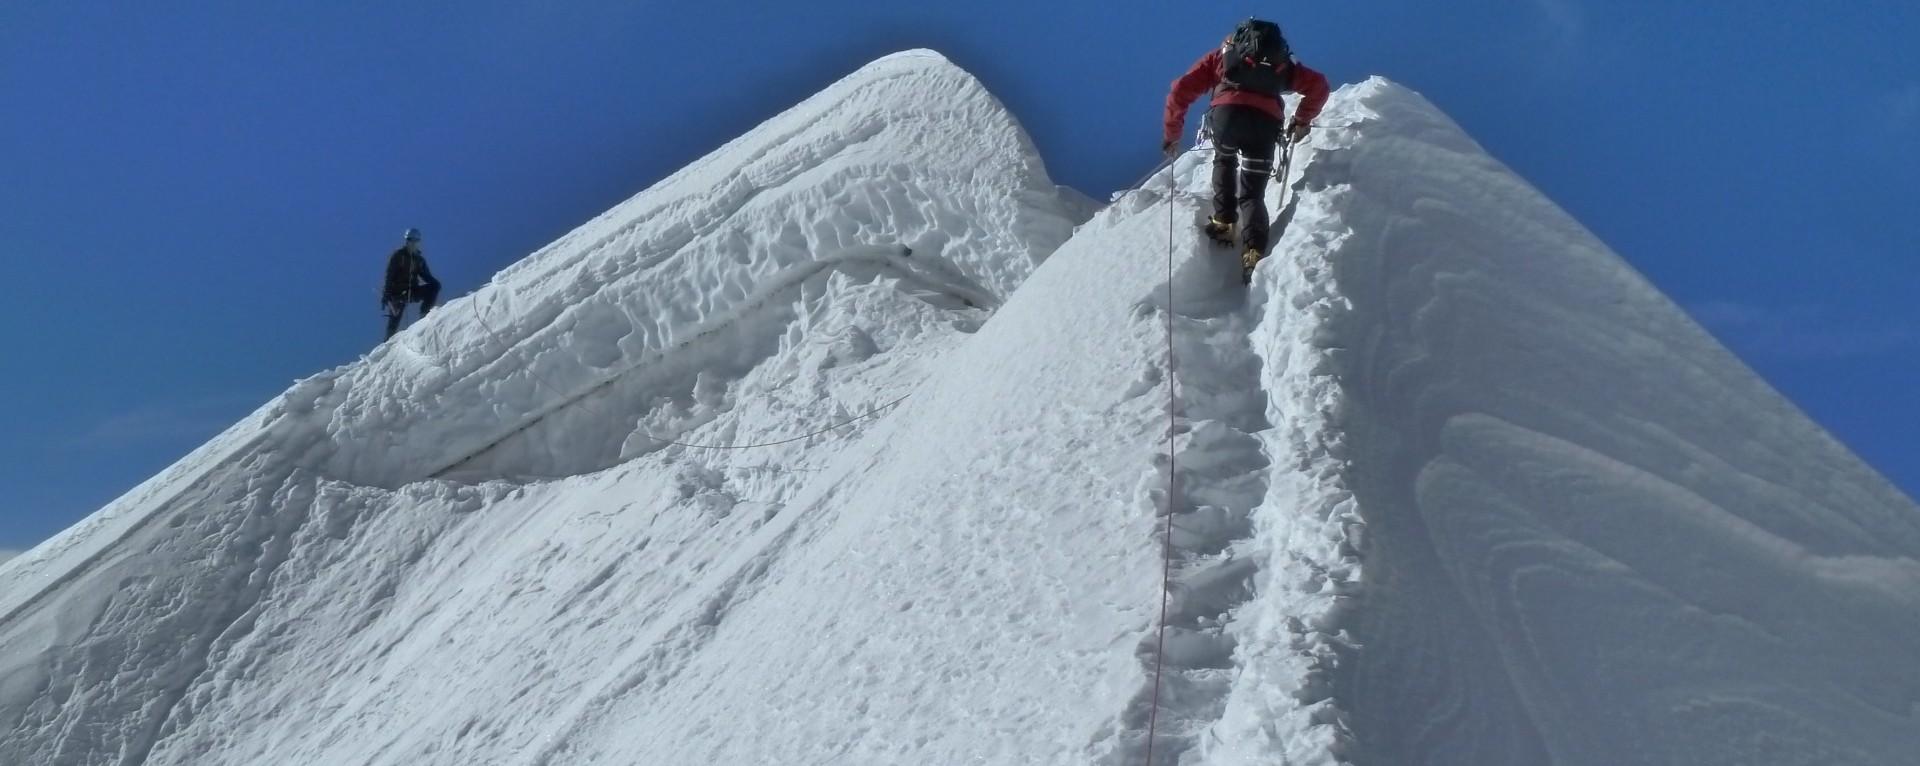 Summit of Tent Peak climbing